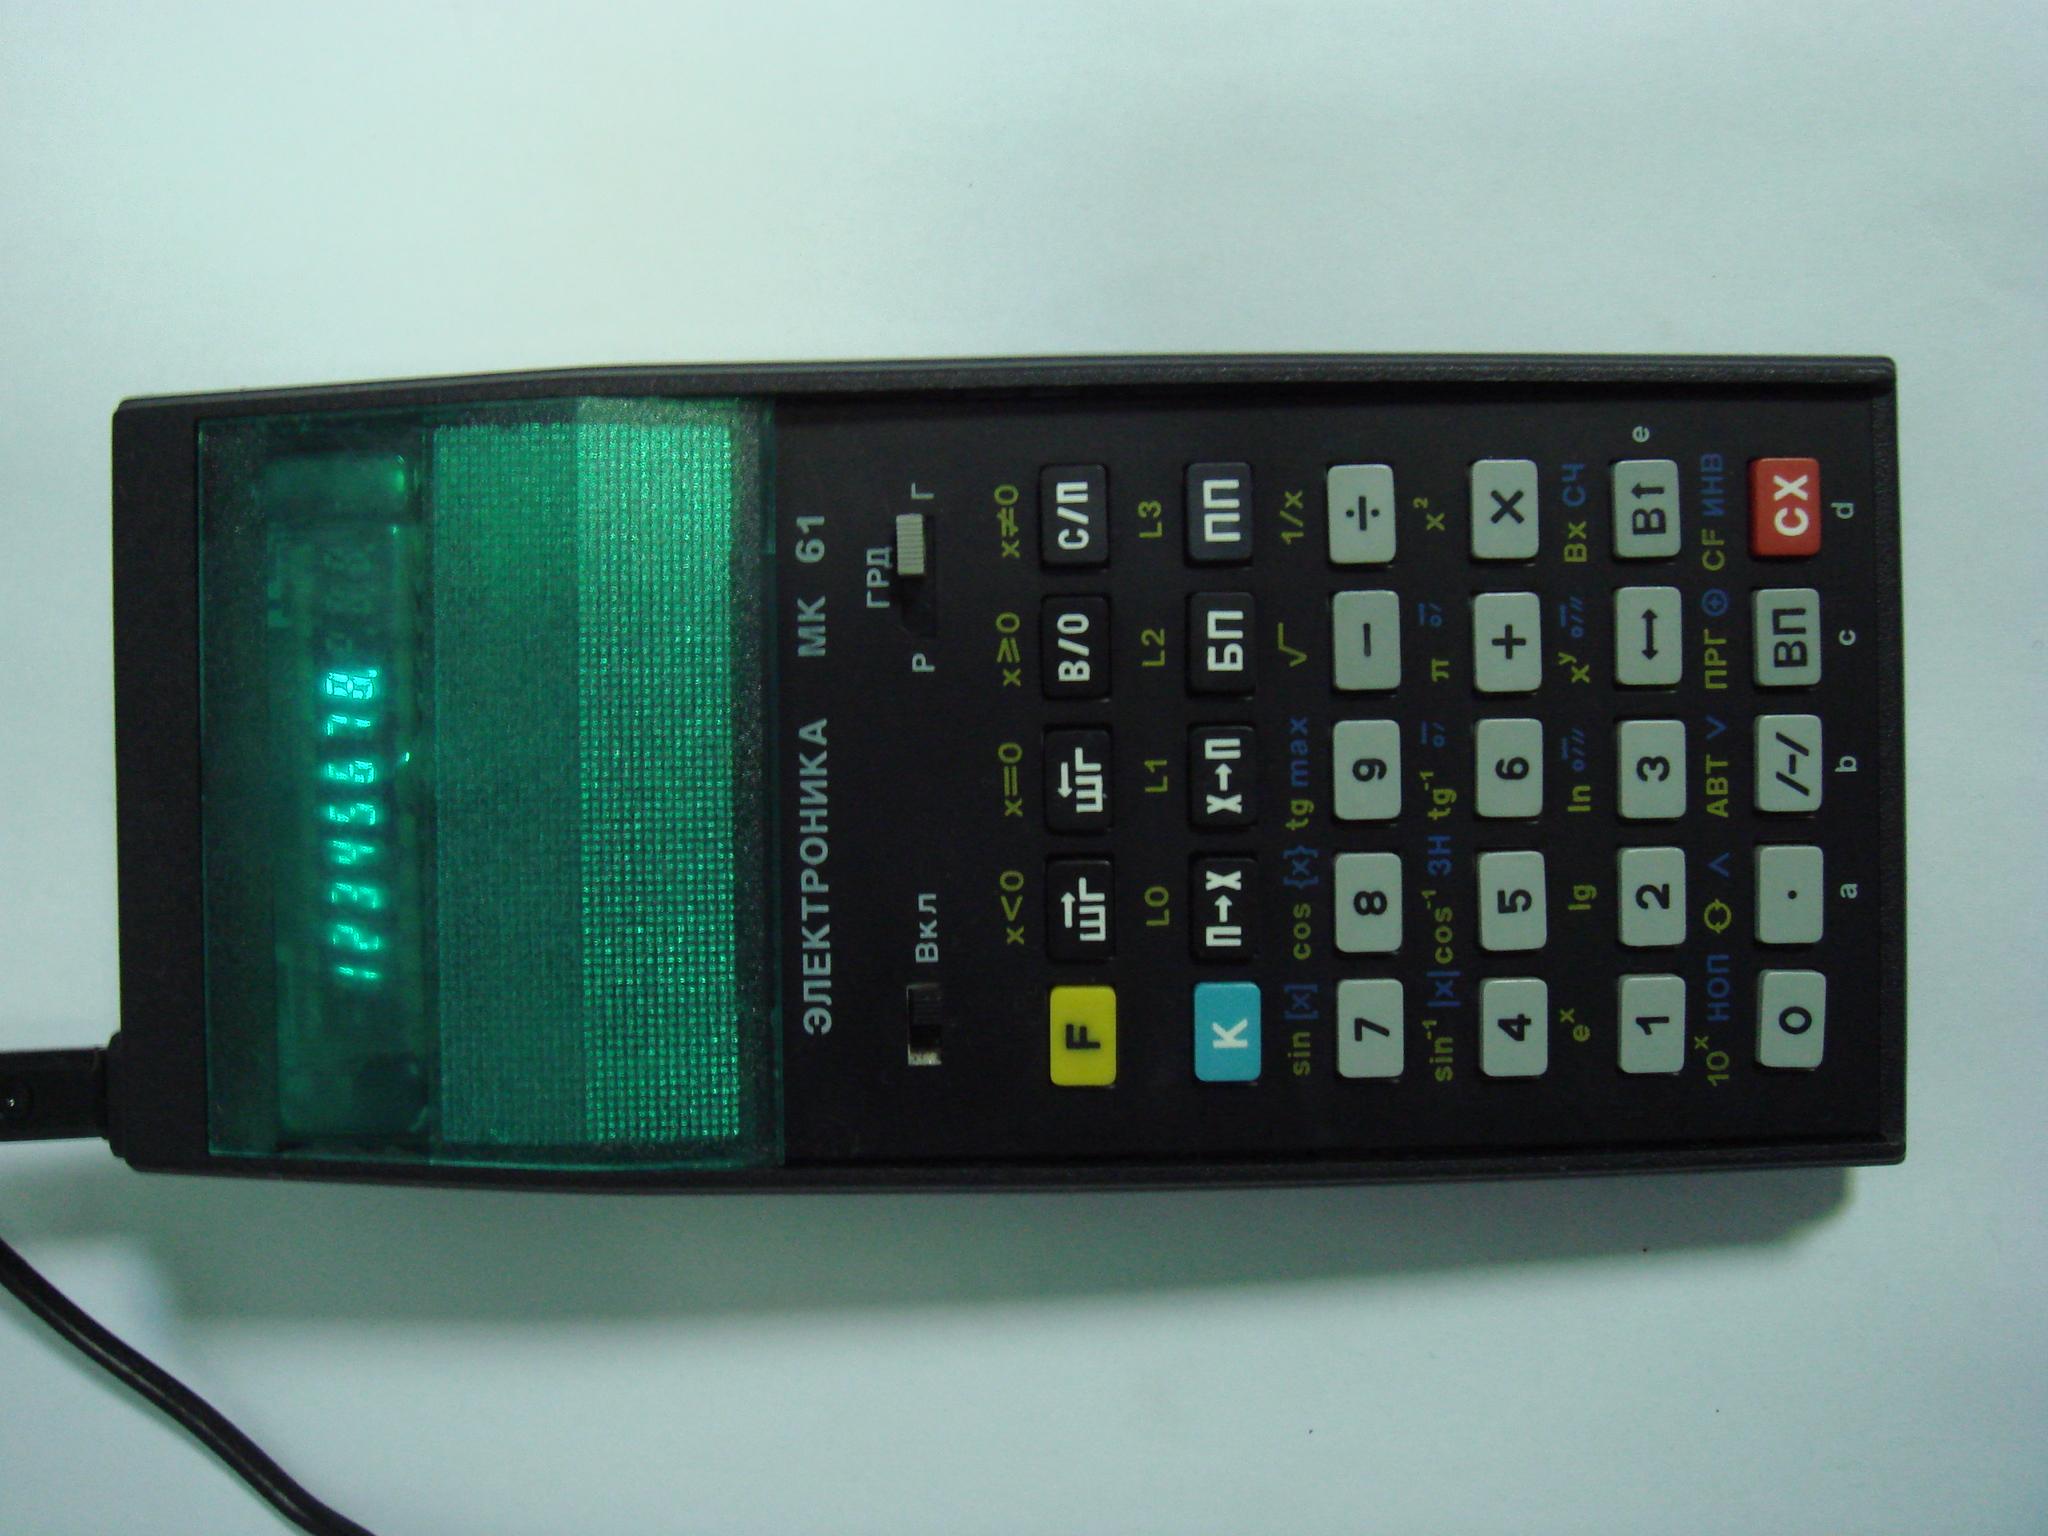 программирование на калькуляторе мк-61